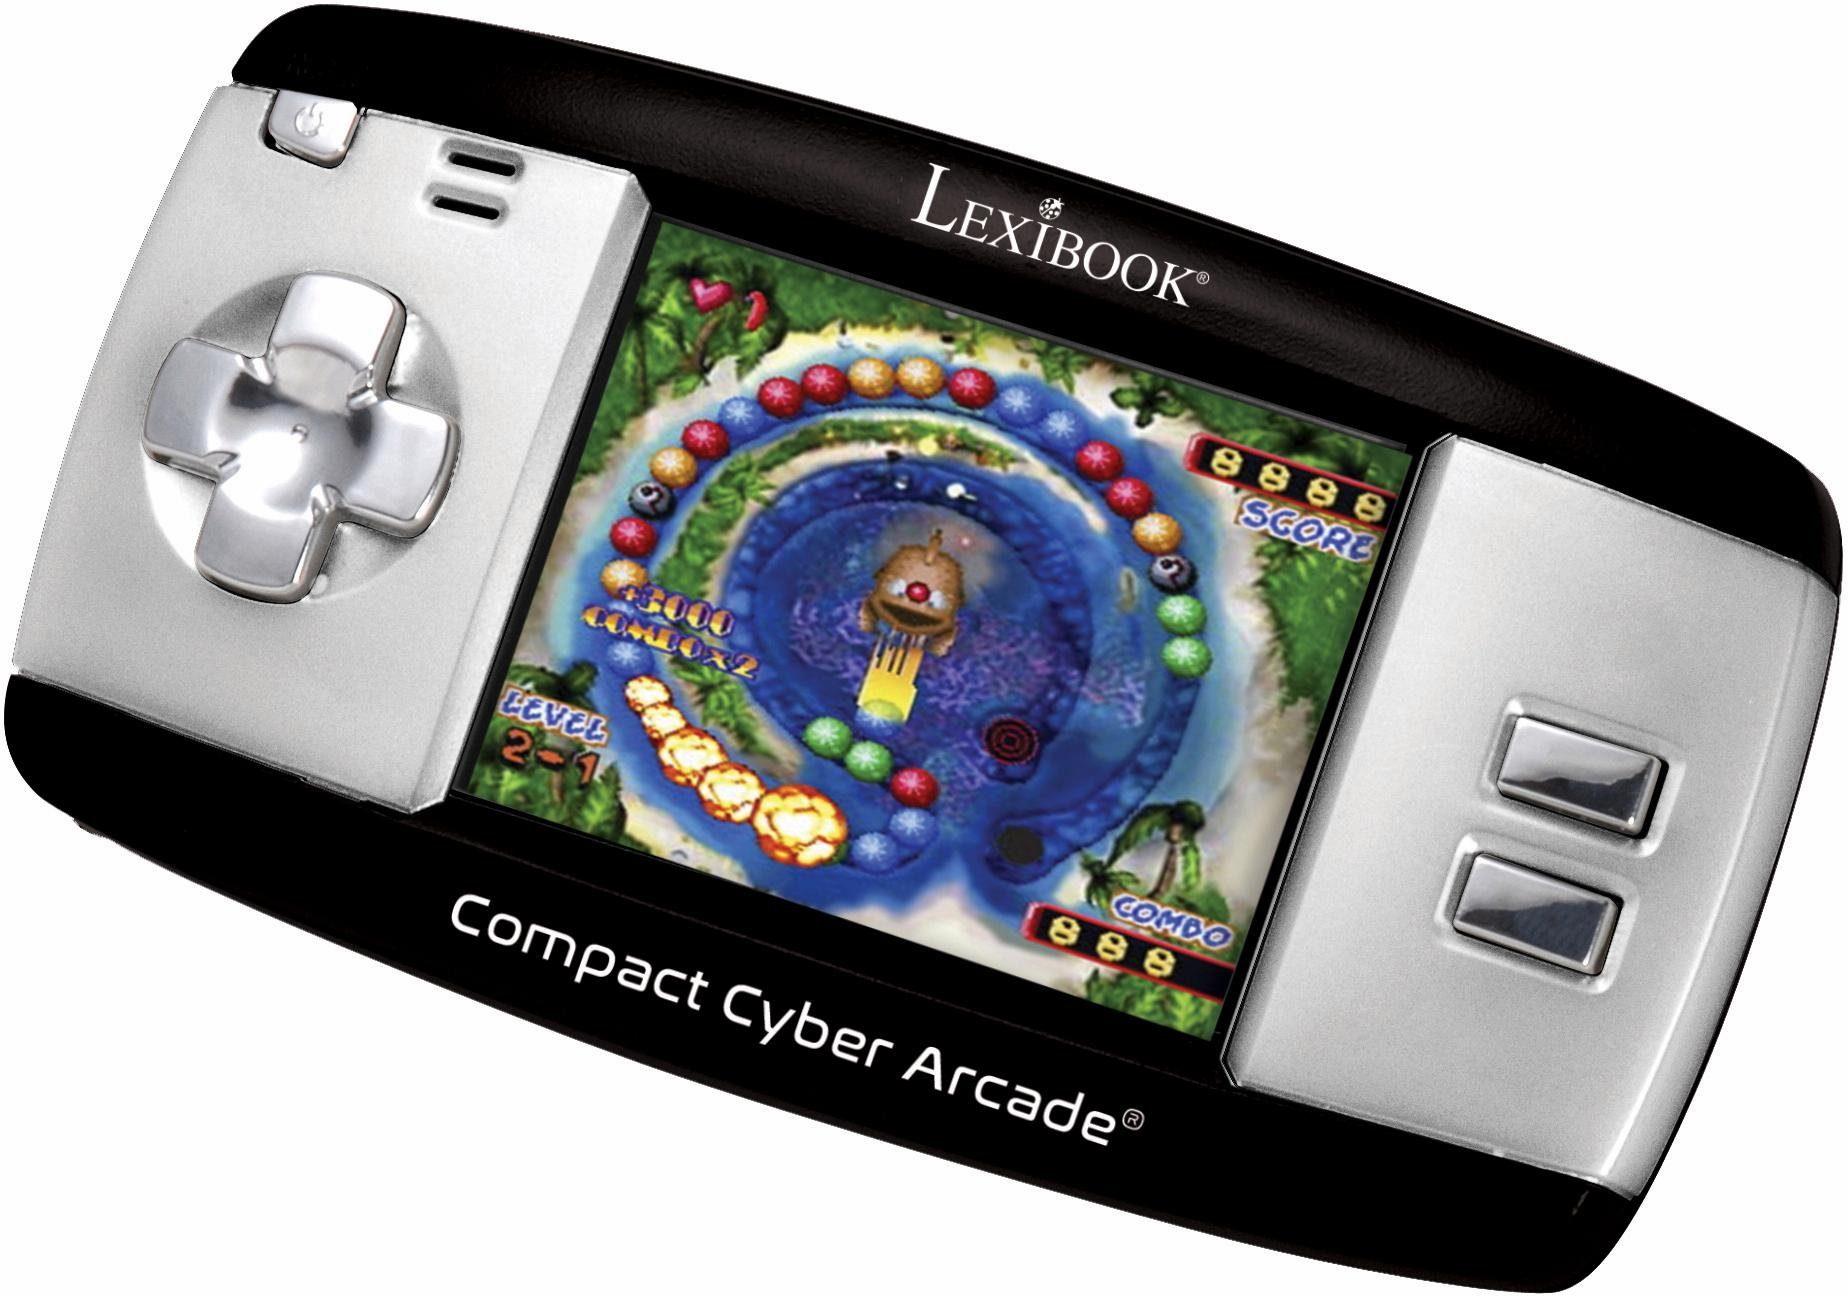 Lexibook Portable Spielekonsole, »Compact Cyber Arcade®«